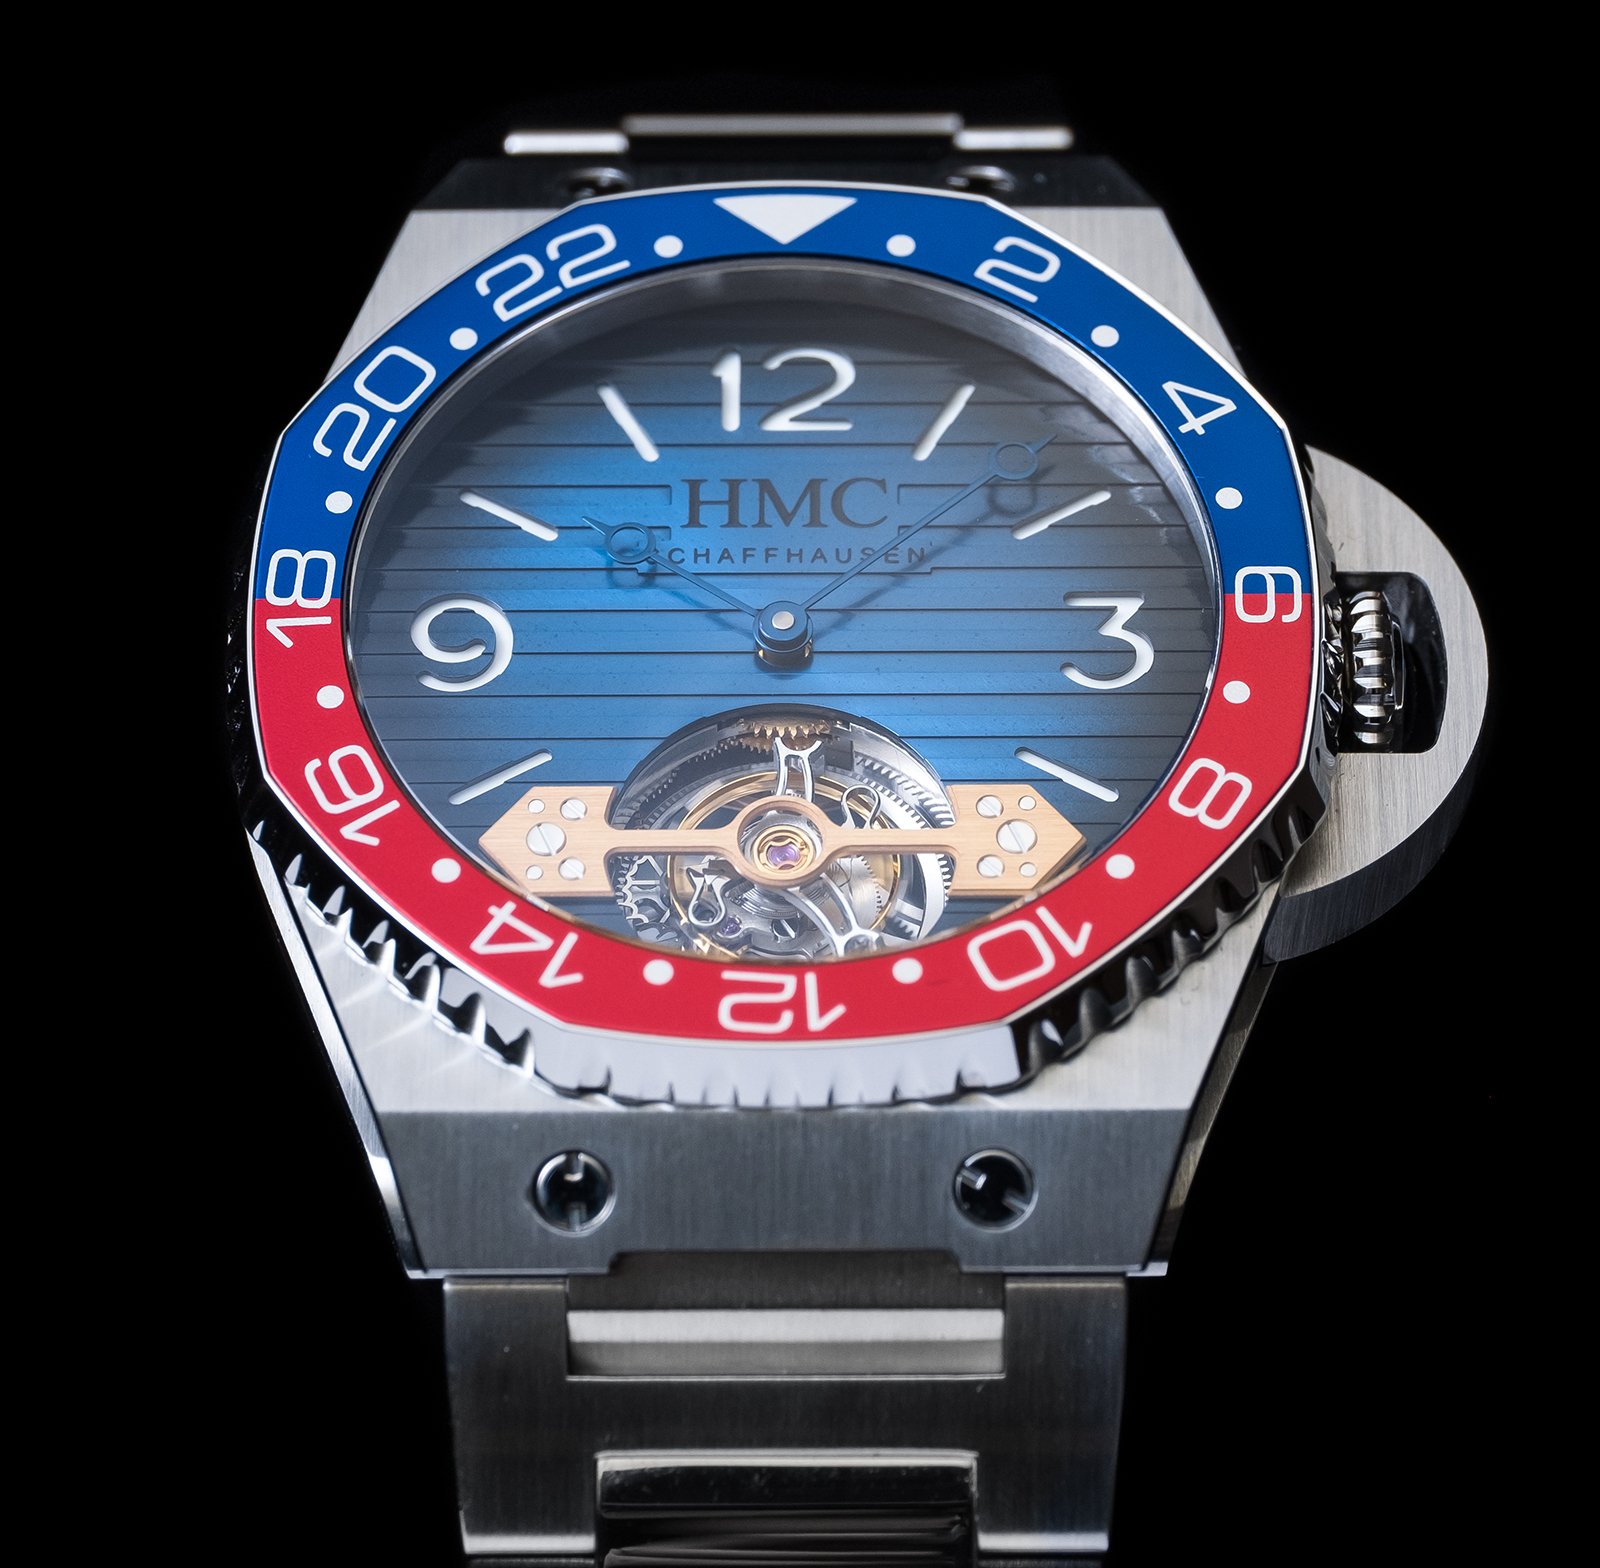 H.Moser & Cie. Swiss Icons Watch_3804-1200_PR_Black Background